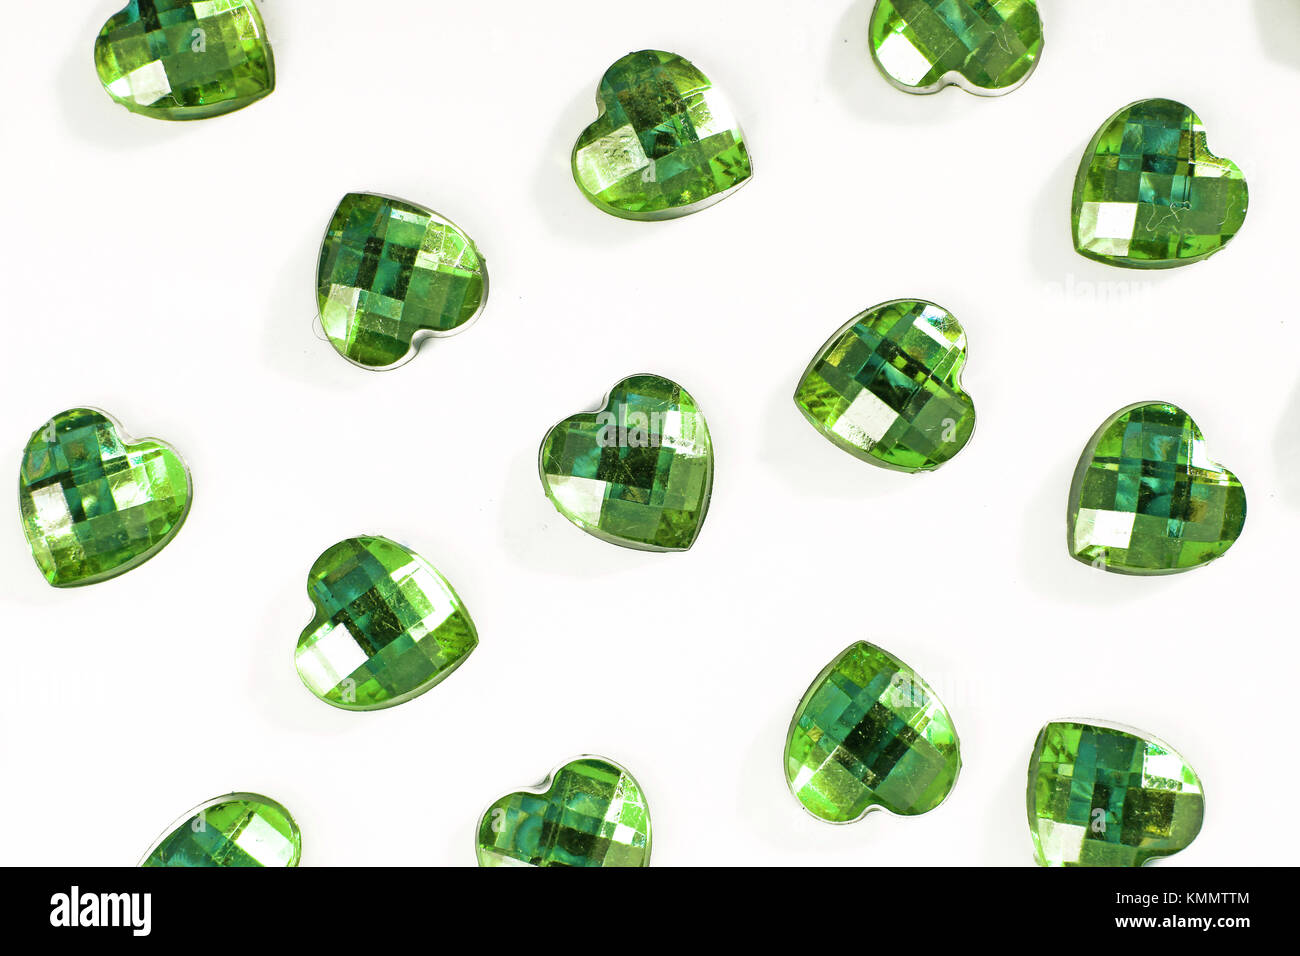 Green Rhinestone background. Heart shape texture as backdrop isolated white studio photo. Bling rhinestone crystal - Stock Image